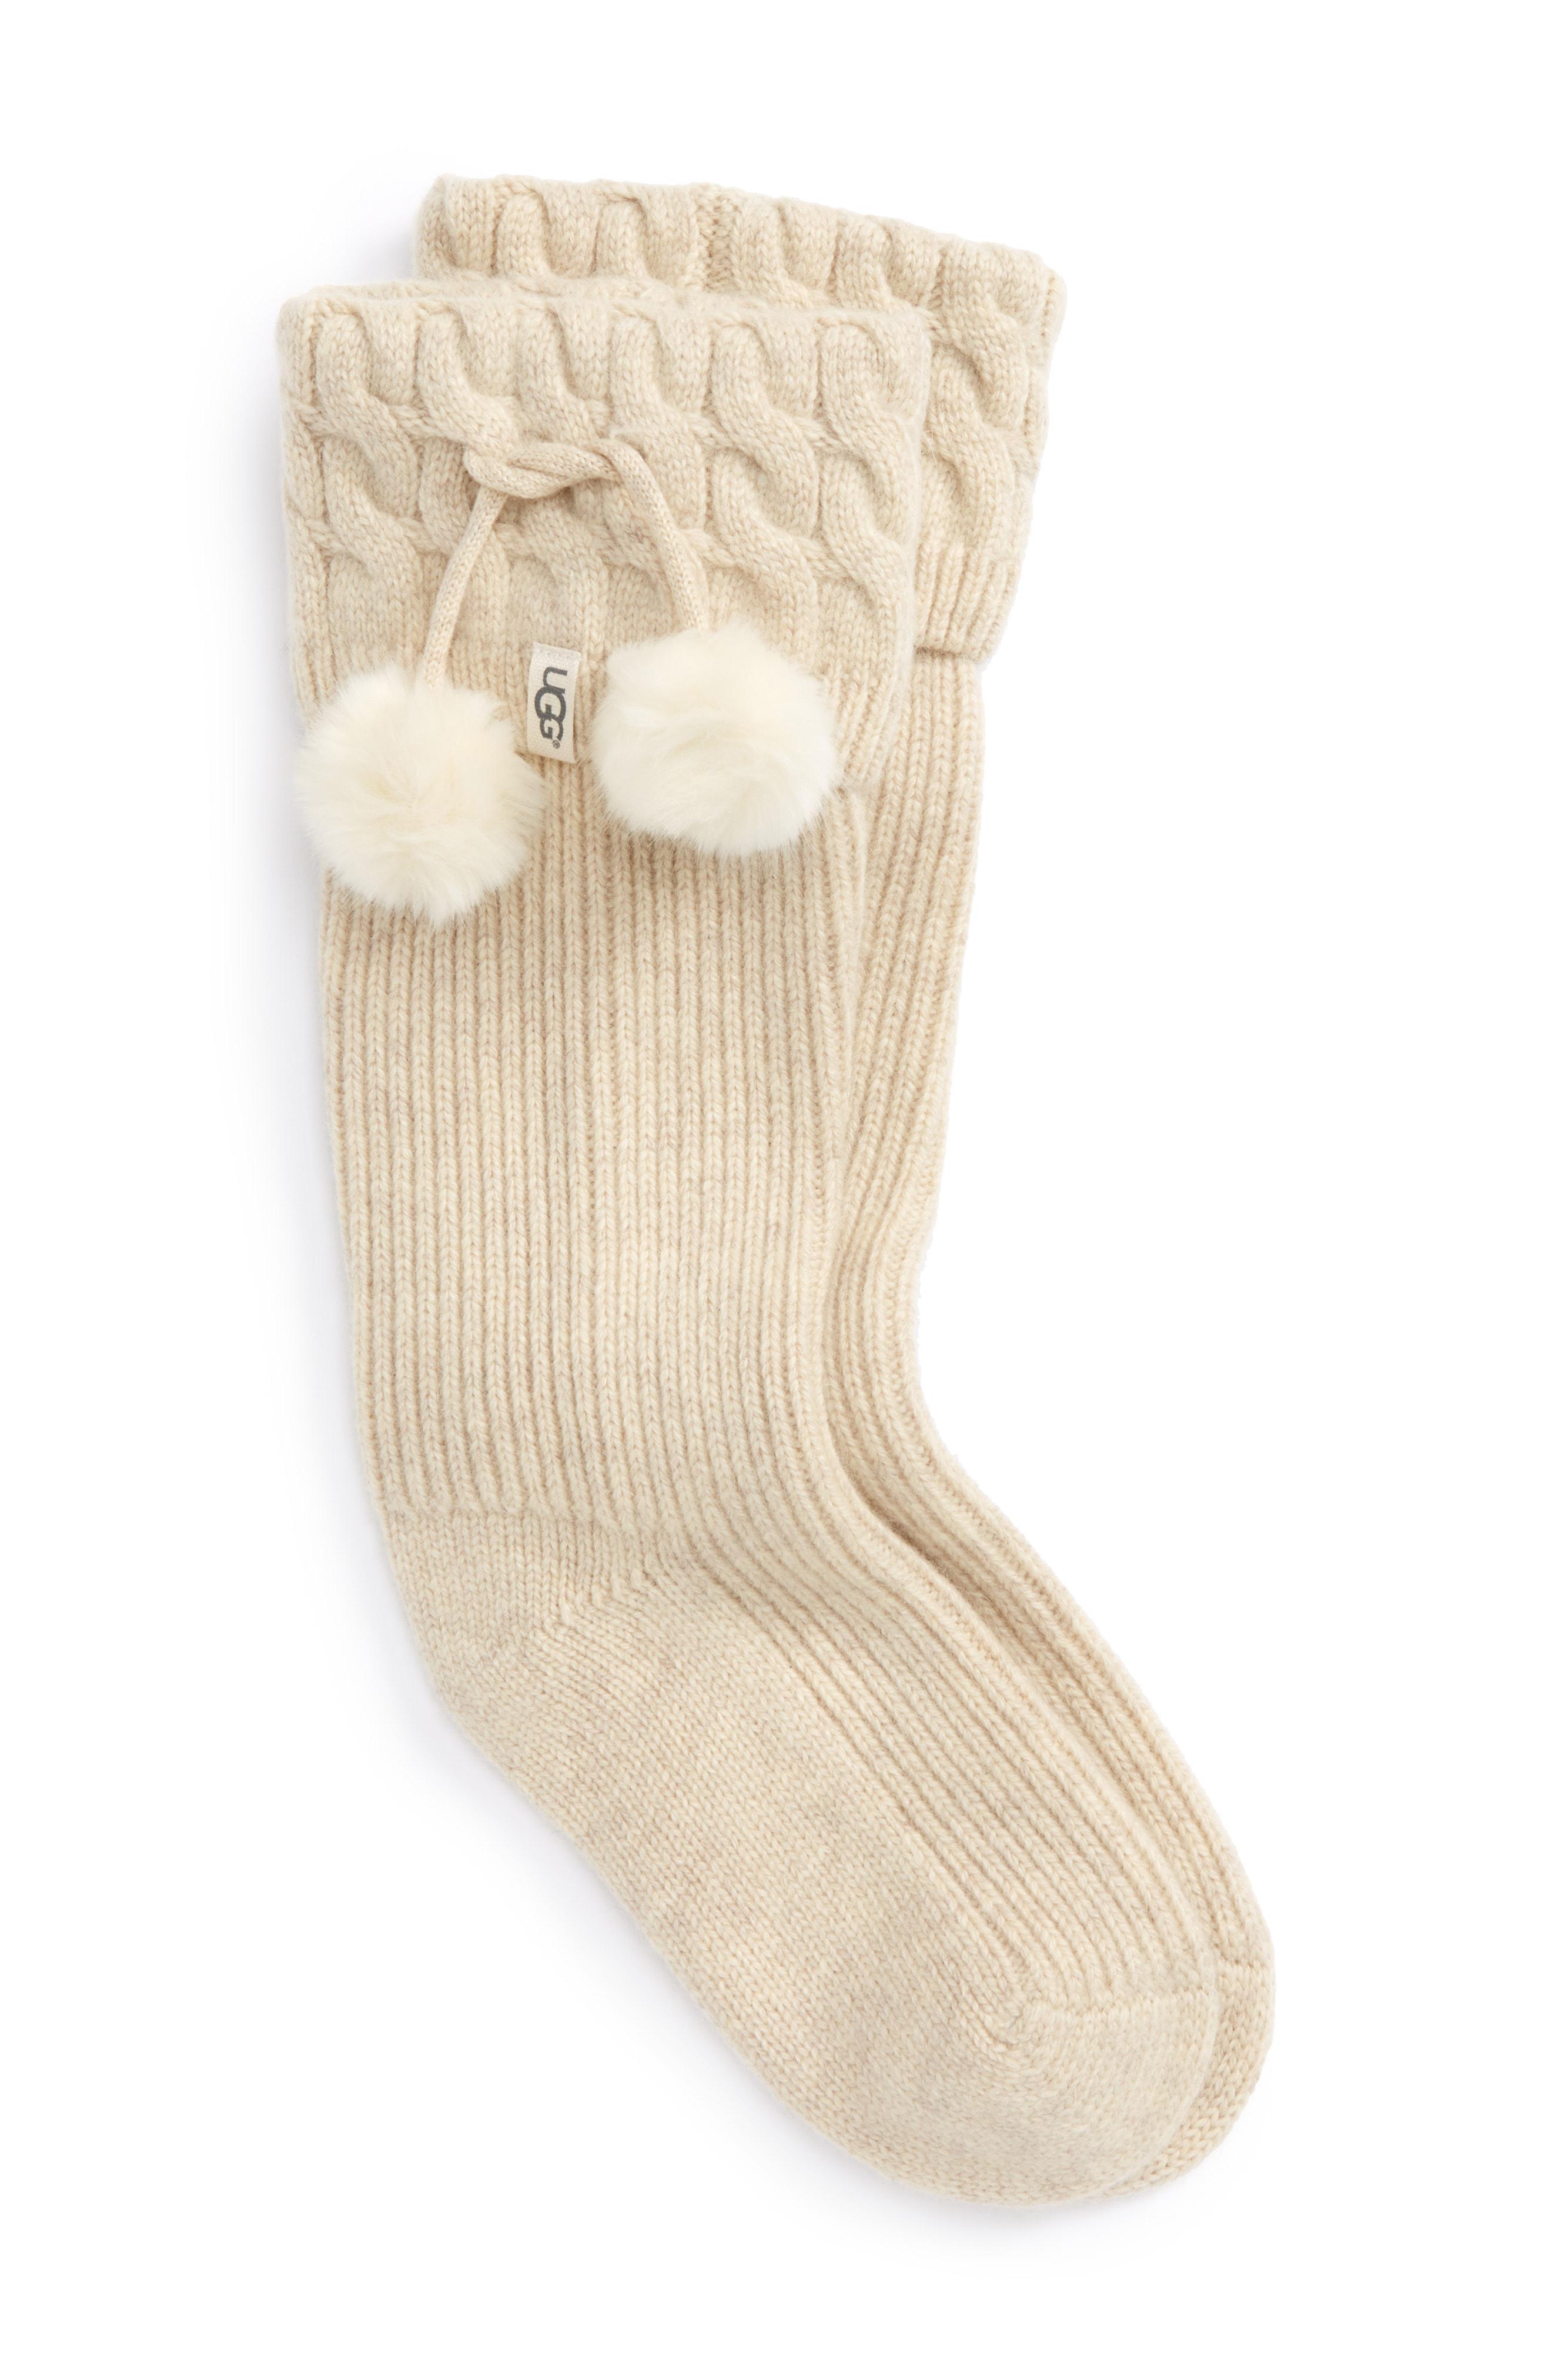 Lyst - Ugg Ugg Uggpure(TM) Pompom Tall Rain Boot Sock in White